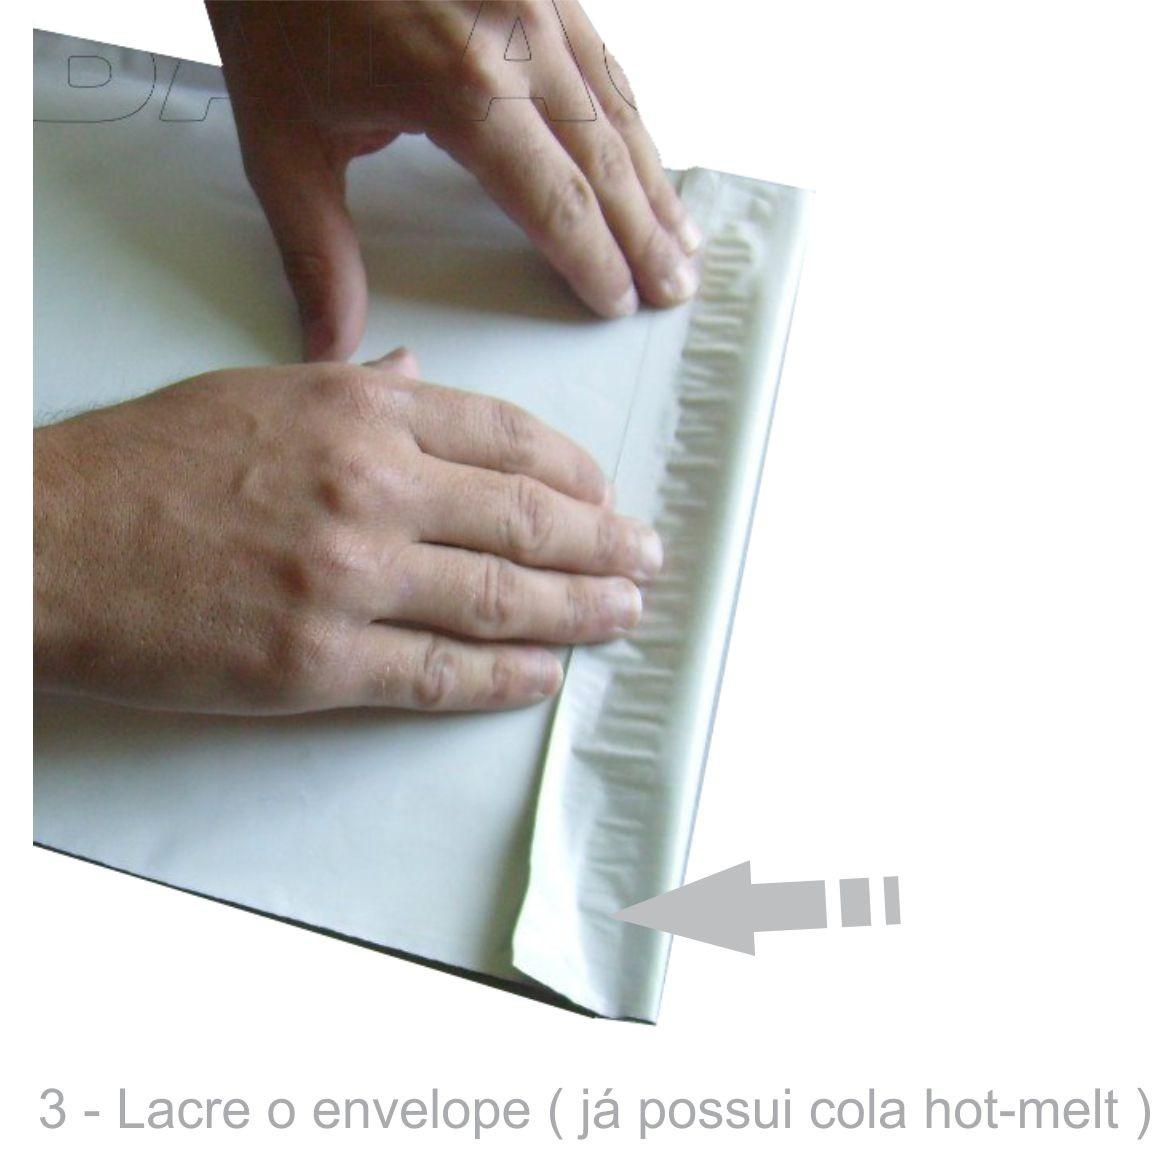 Envelope Plástico Segurança Lacre Tipo Sedex 20x20 (250 ou 500 Unidades)